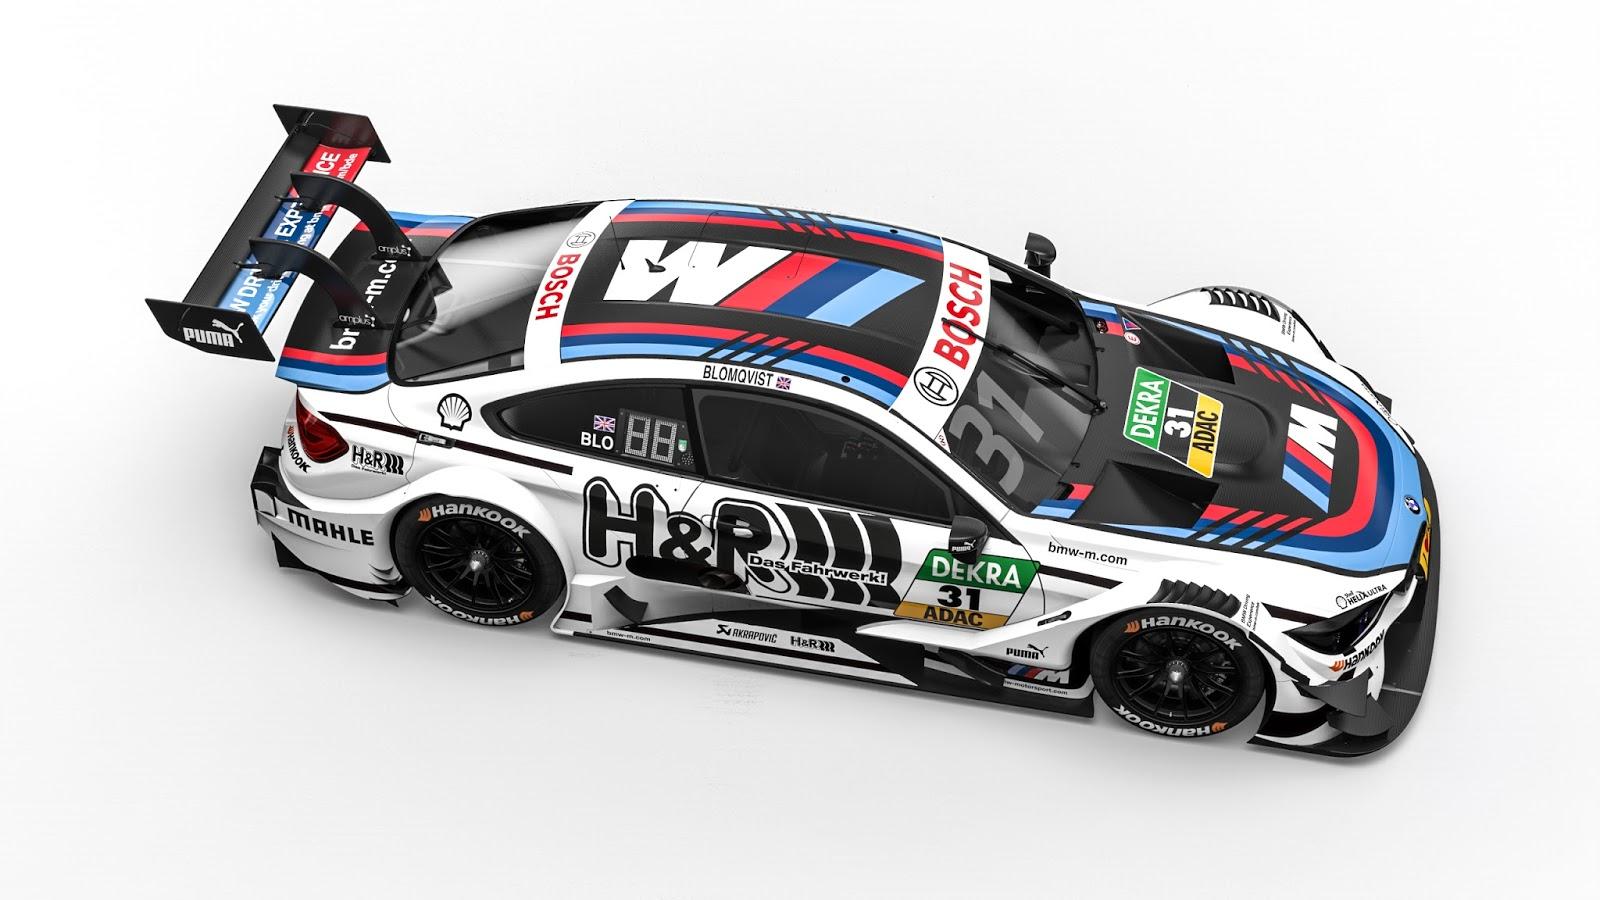 P90255231 highRes 21st april 2017 muni Η BMW Motorsport ξεκινά τη νέα σεζόν με ισχυρούς εταίρους Akrapovič, BMW, Bmw Bank, BMW M4 DTM, BMW M6, BMW M6 GT3, BMW Motorsport, DTM, Red Bull, Samsung, Shell, αγωνες